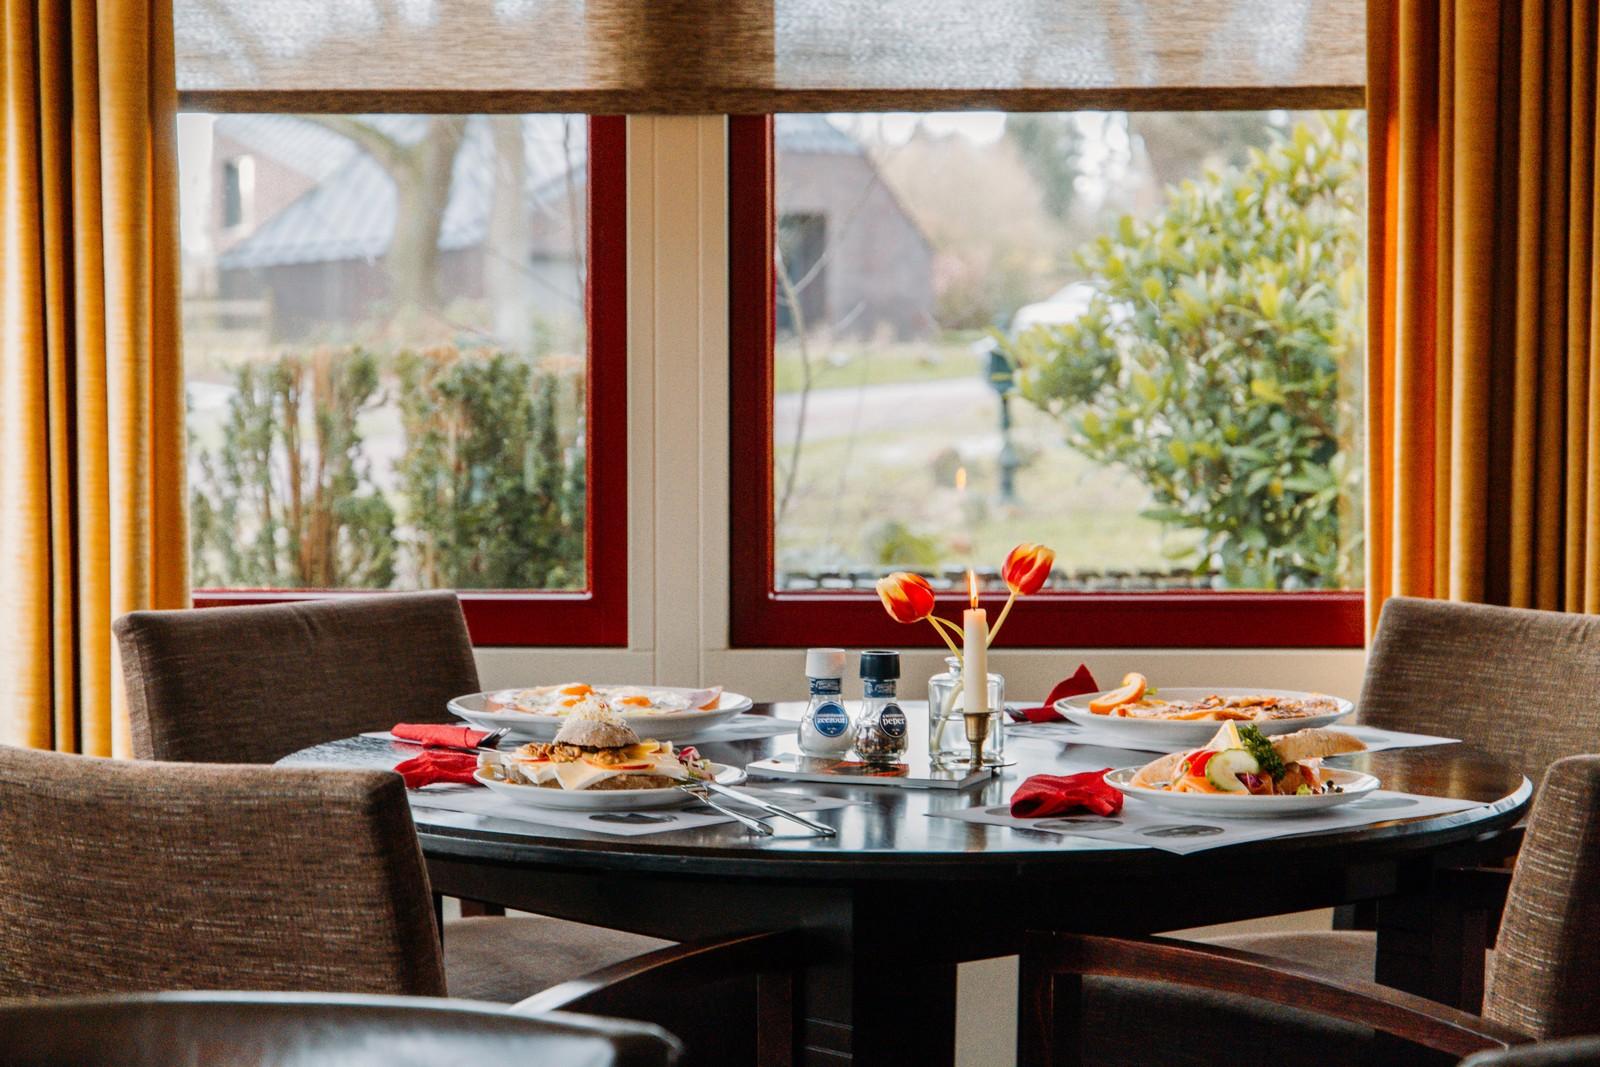 Restaurant Wielens Noord Sleen Image00073